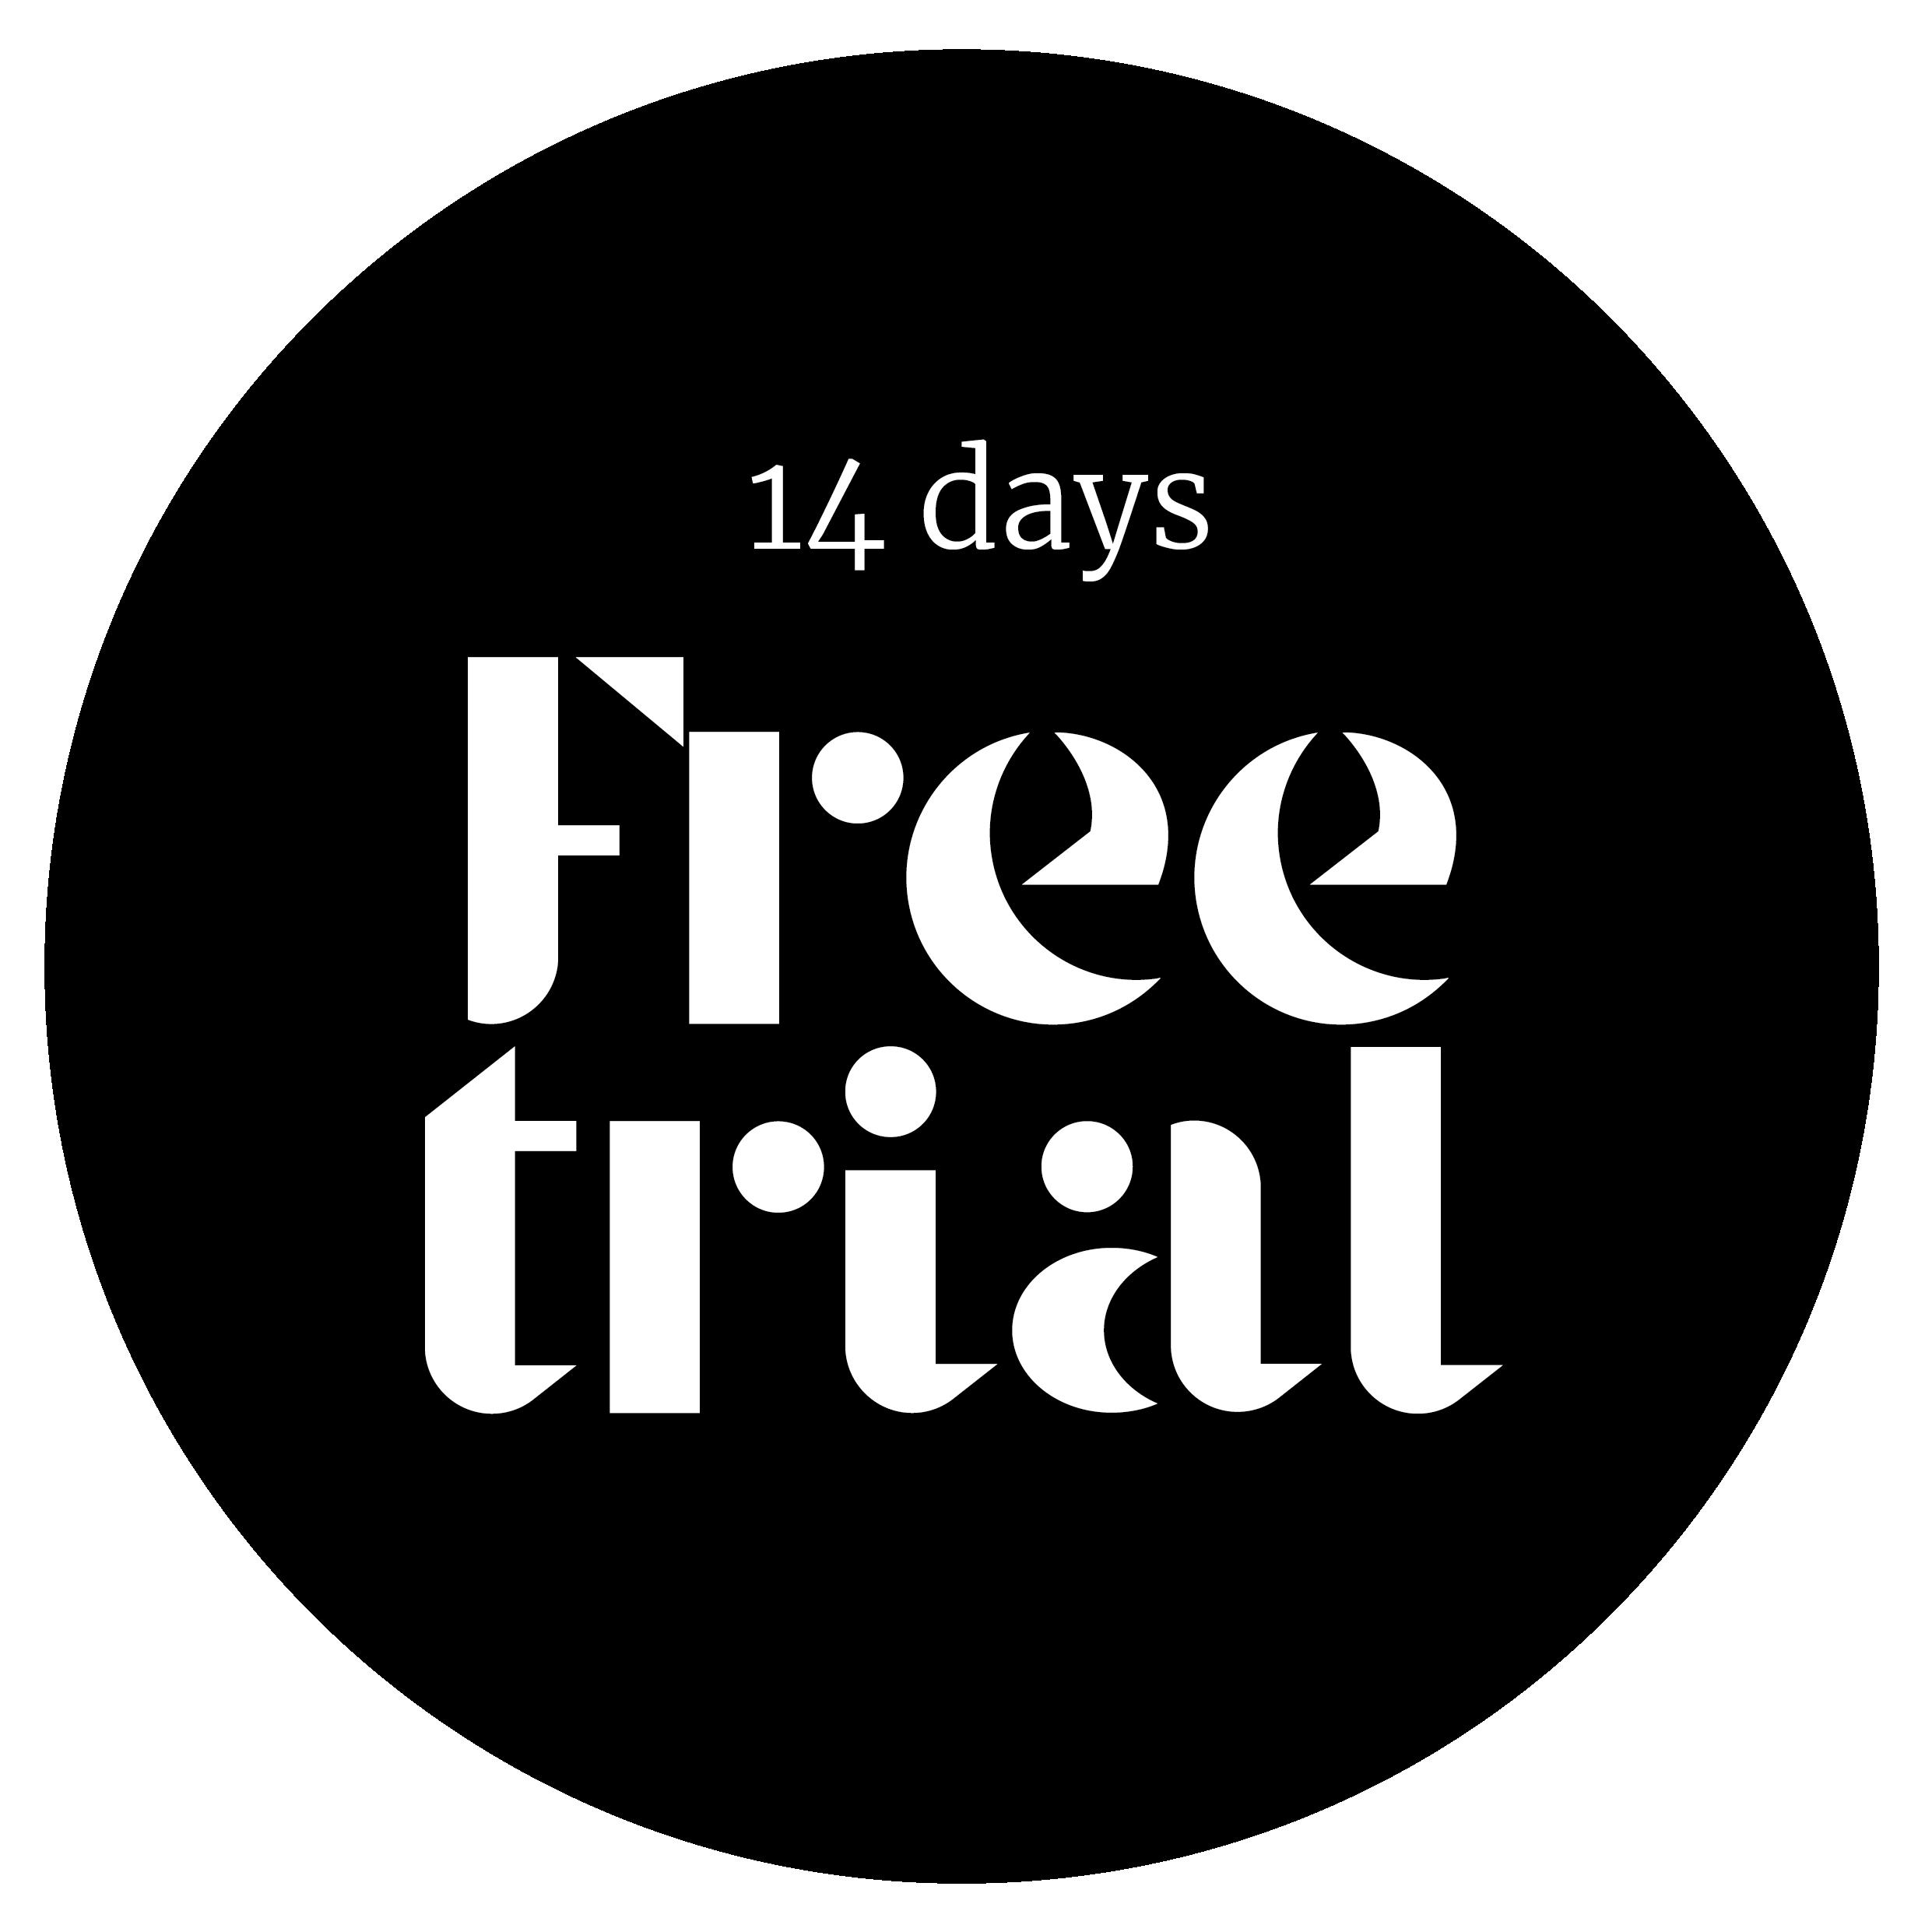 Free Trial-14 days